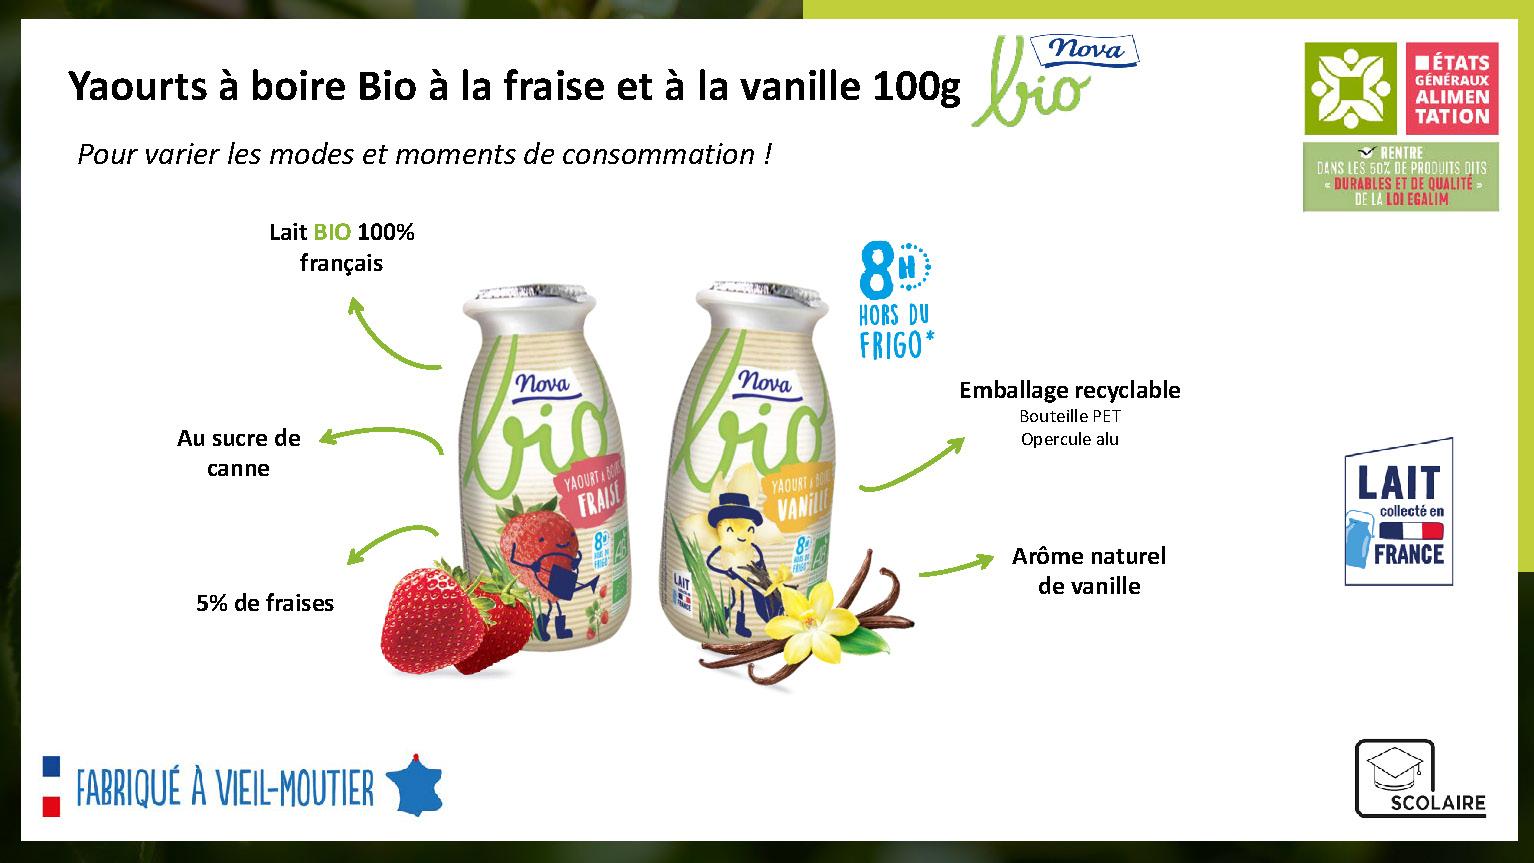 http://vici-restauration.com/wp-content/uploads/Argu-Yaourts-à-boire-BIO-Nova.pdf